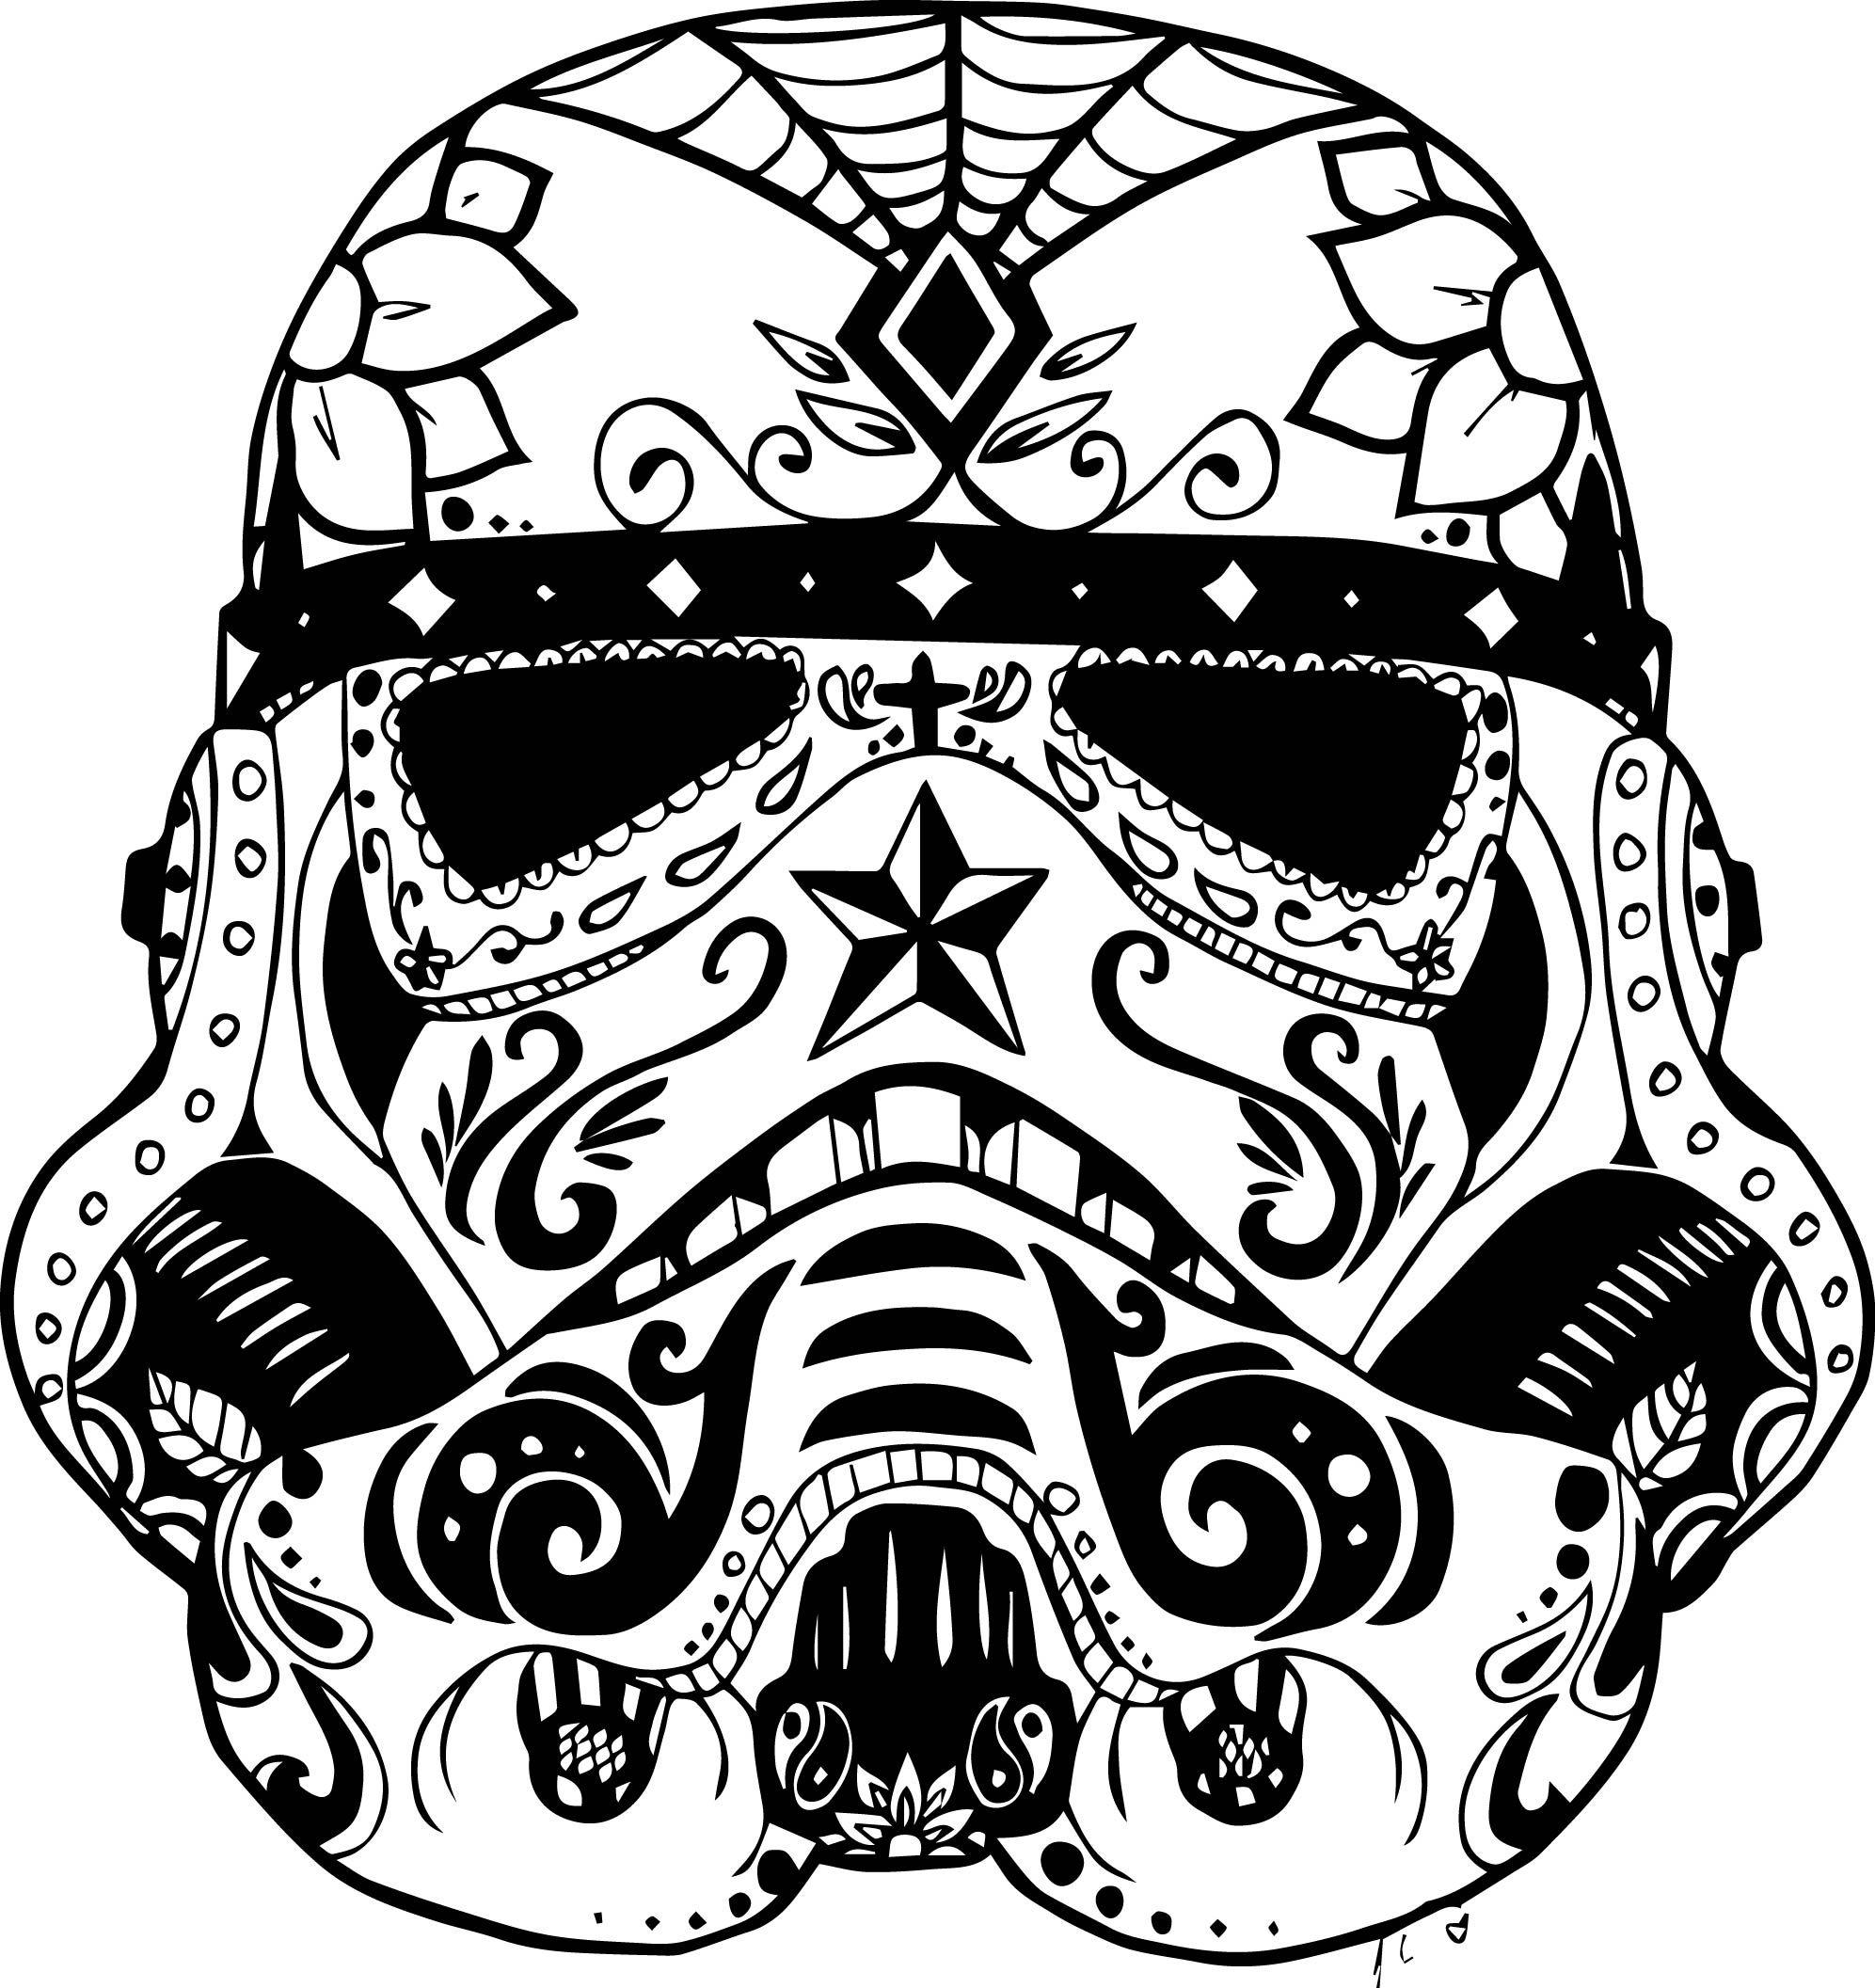 http://www.mcoloring.com/index.php/2015/11/29/sugar-skull-animal ...